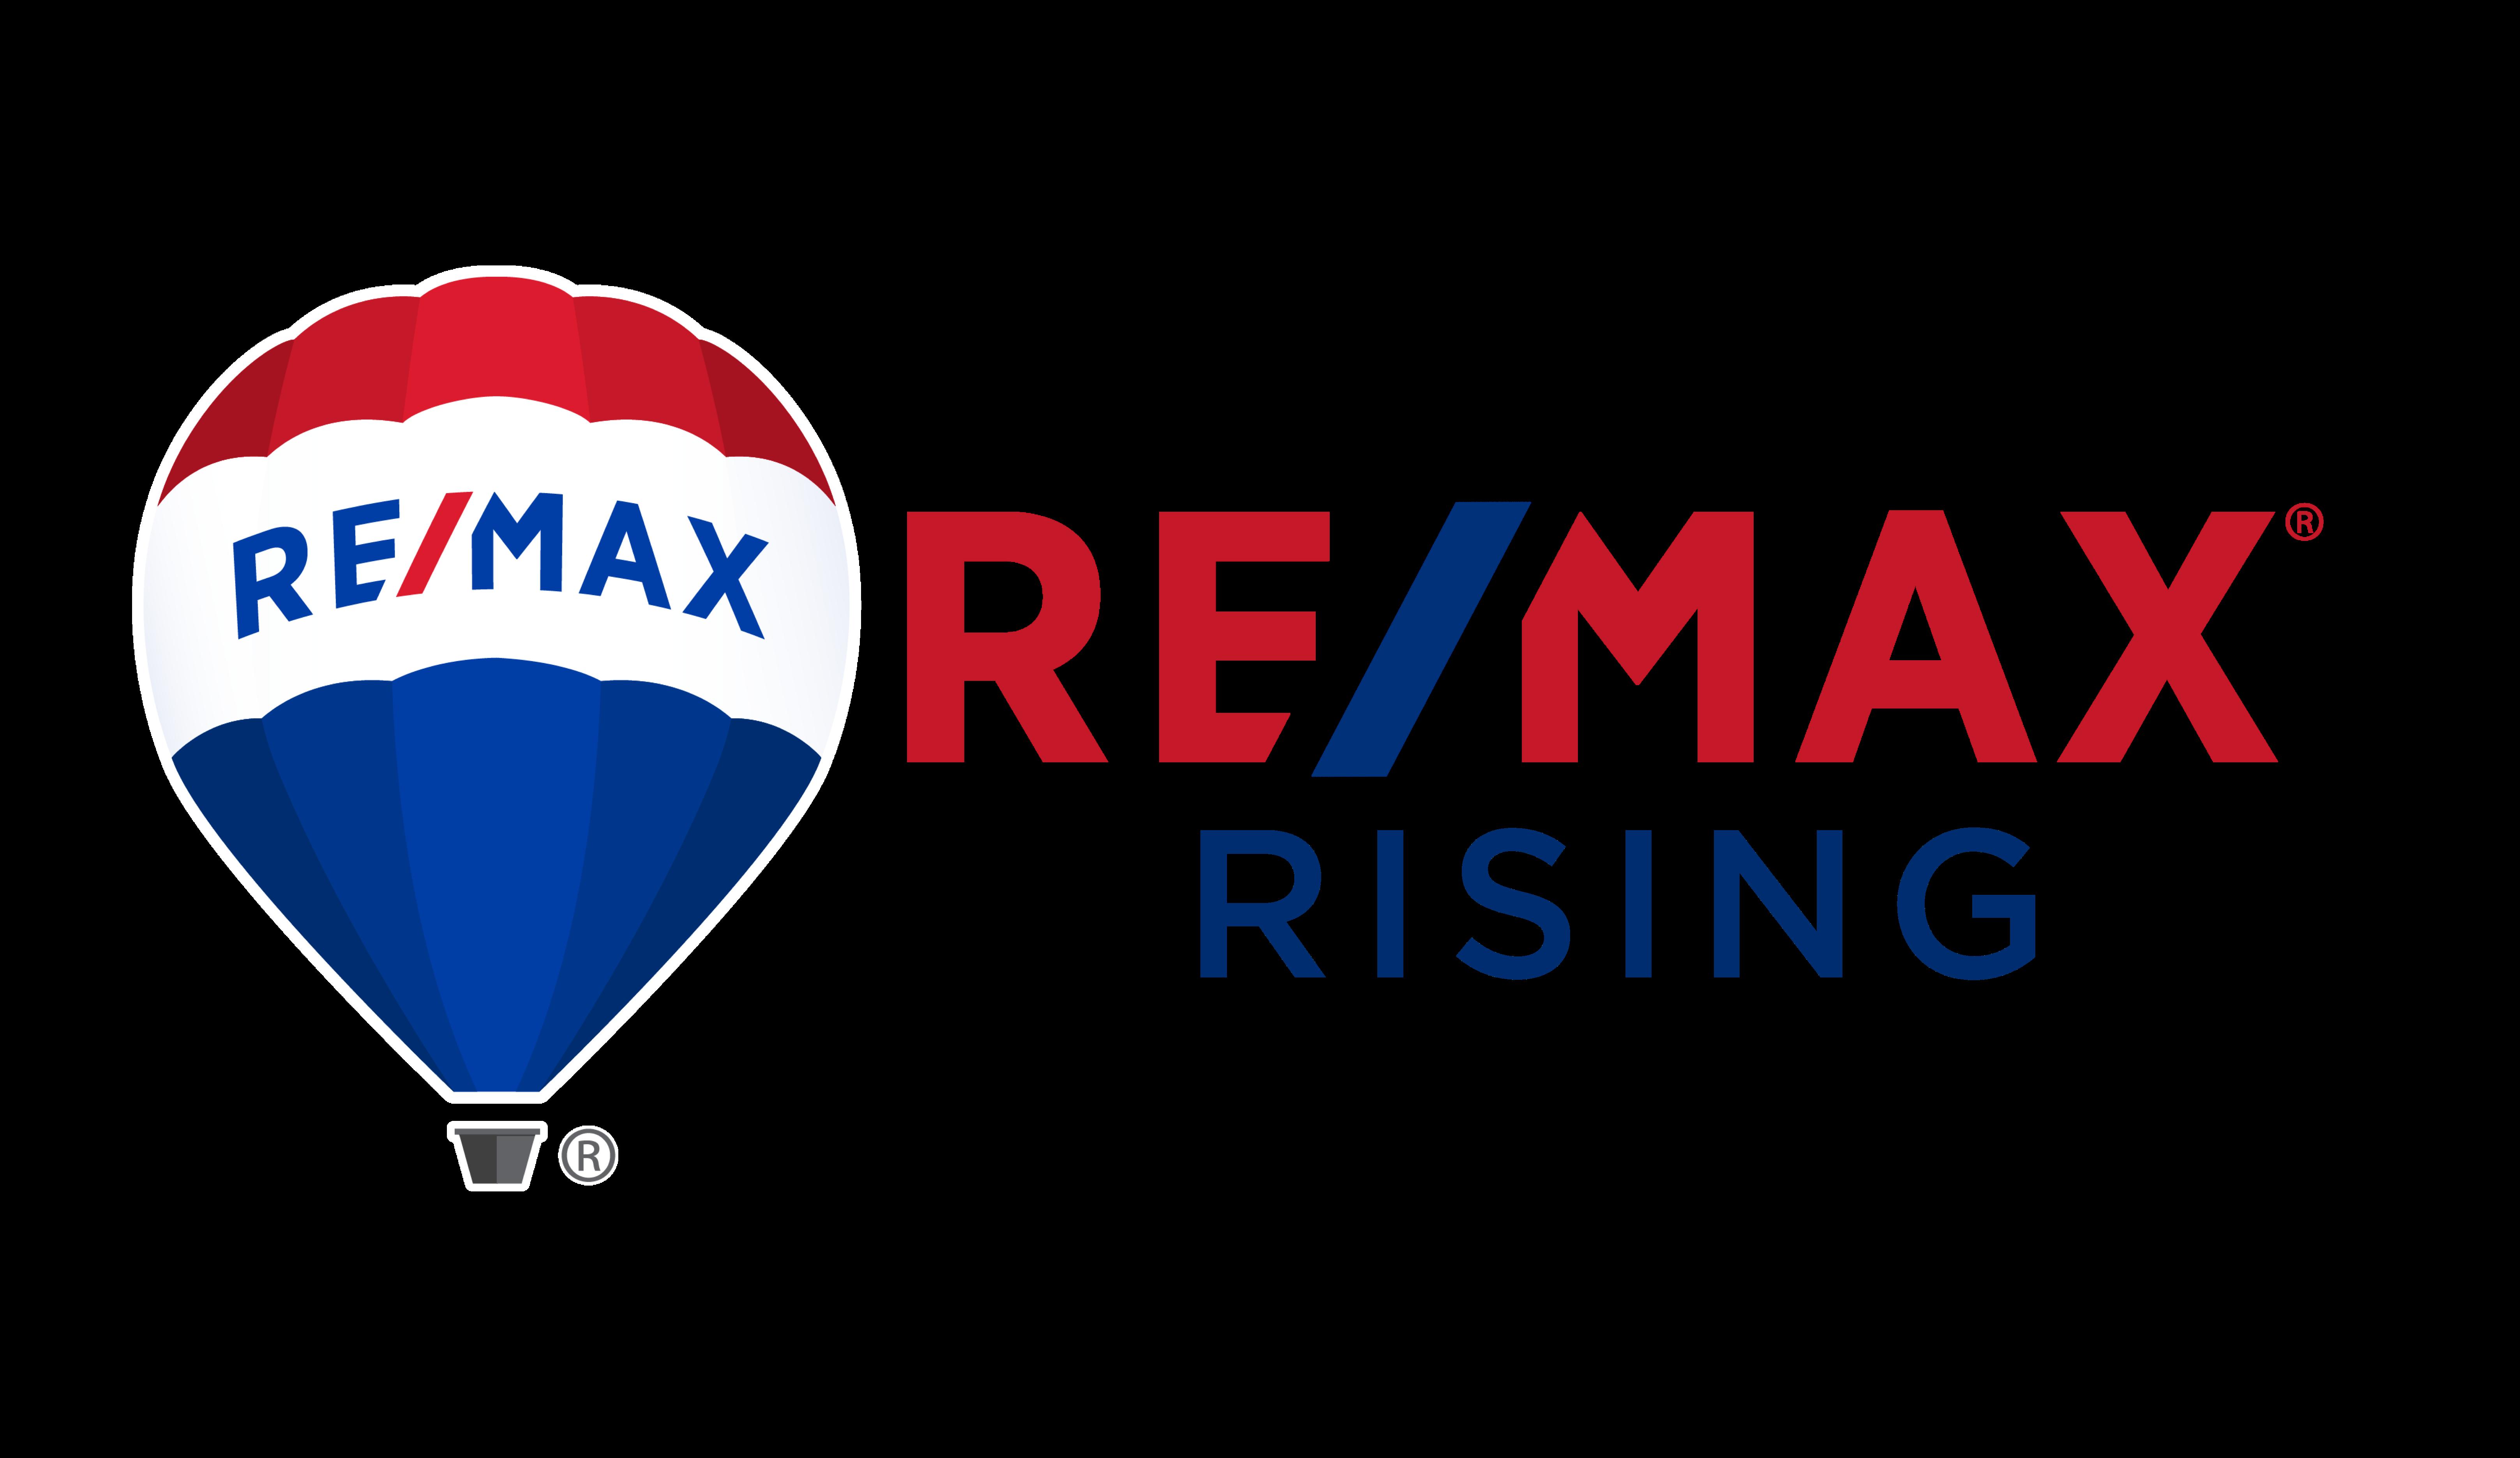 RE/MAX Rising